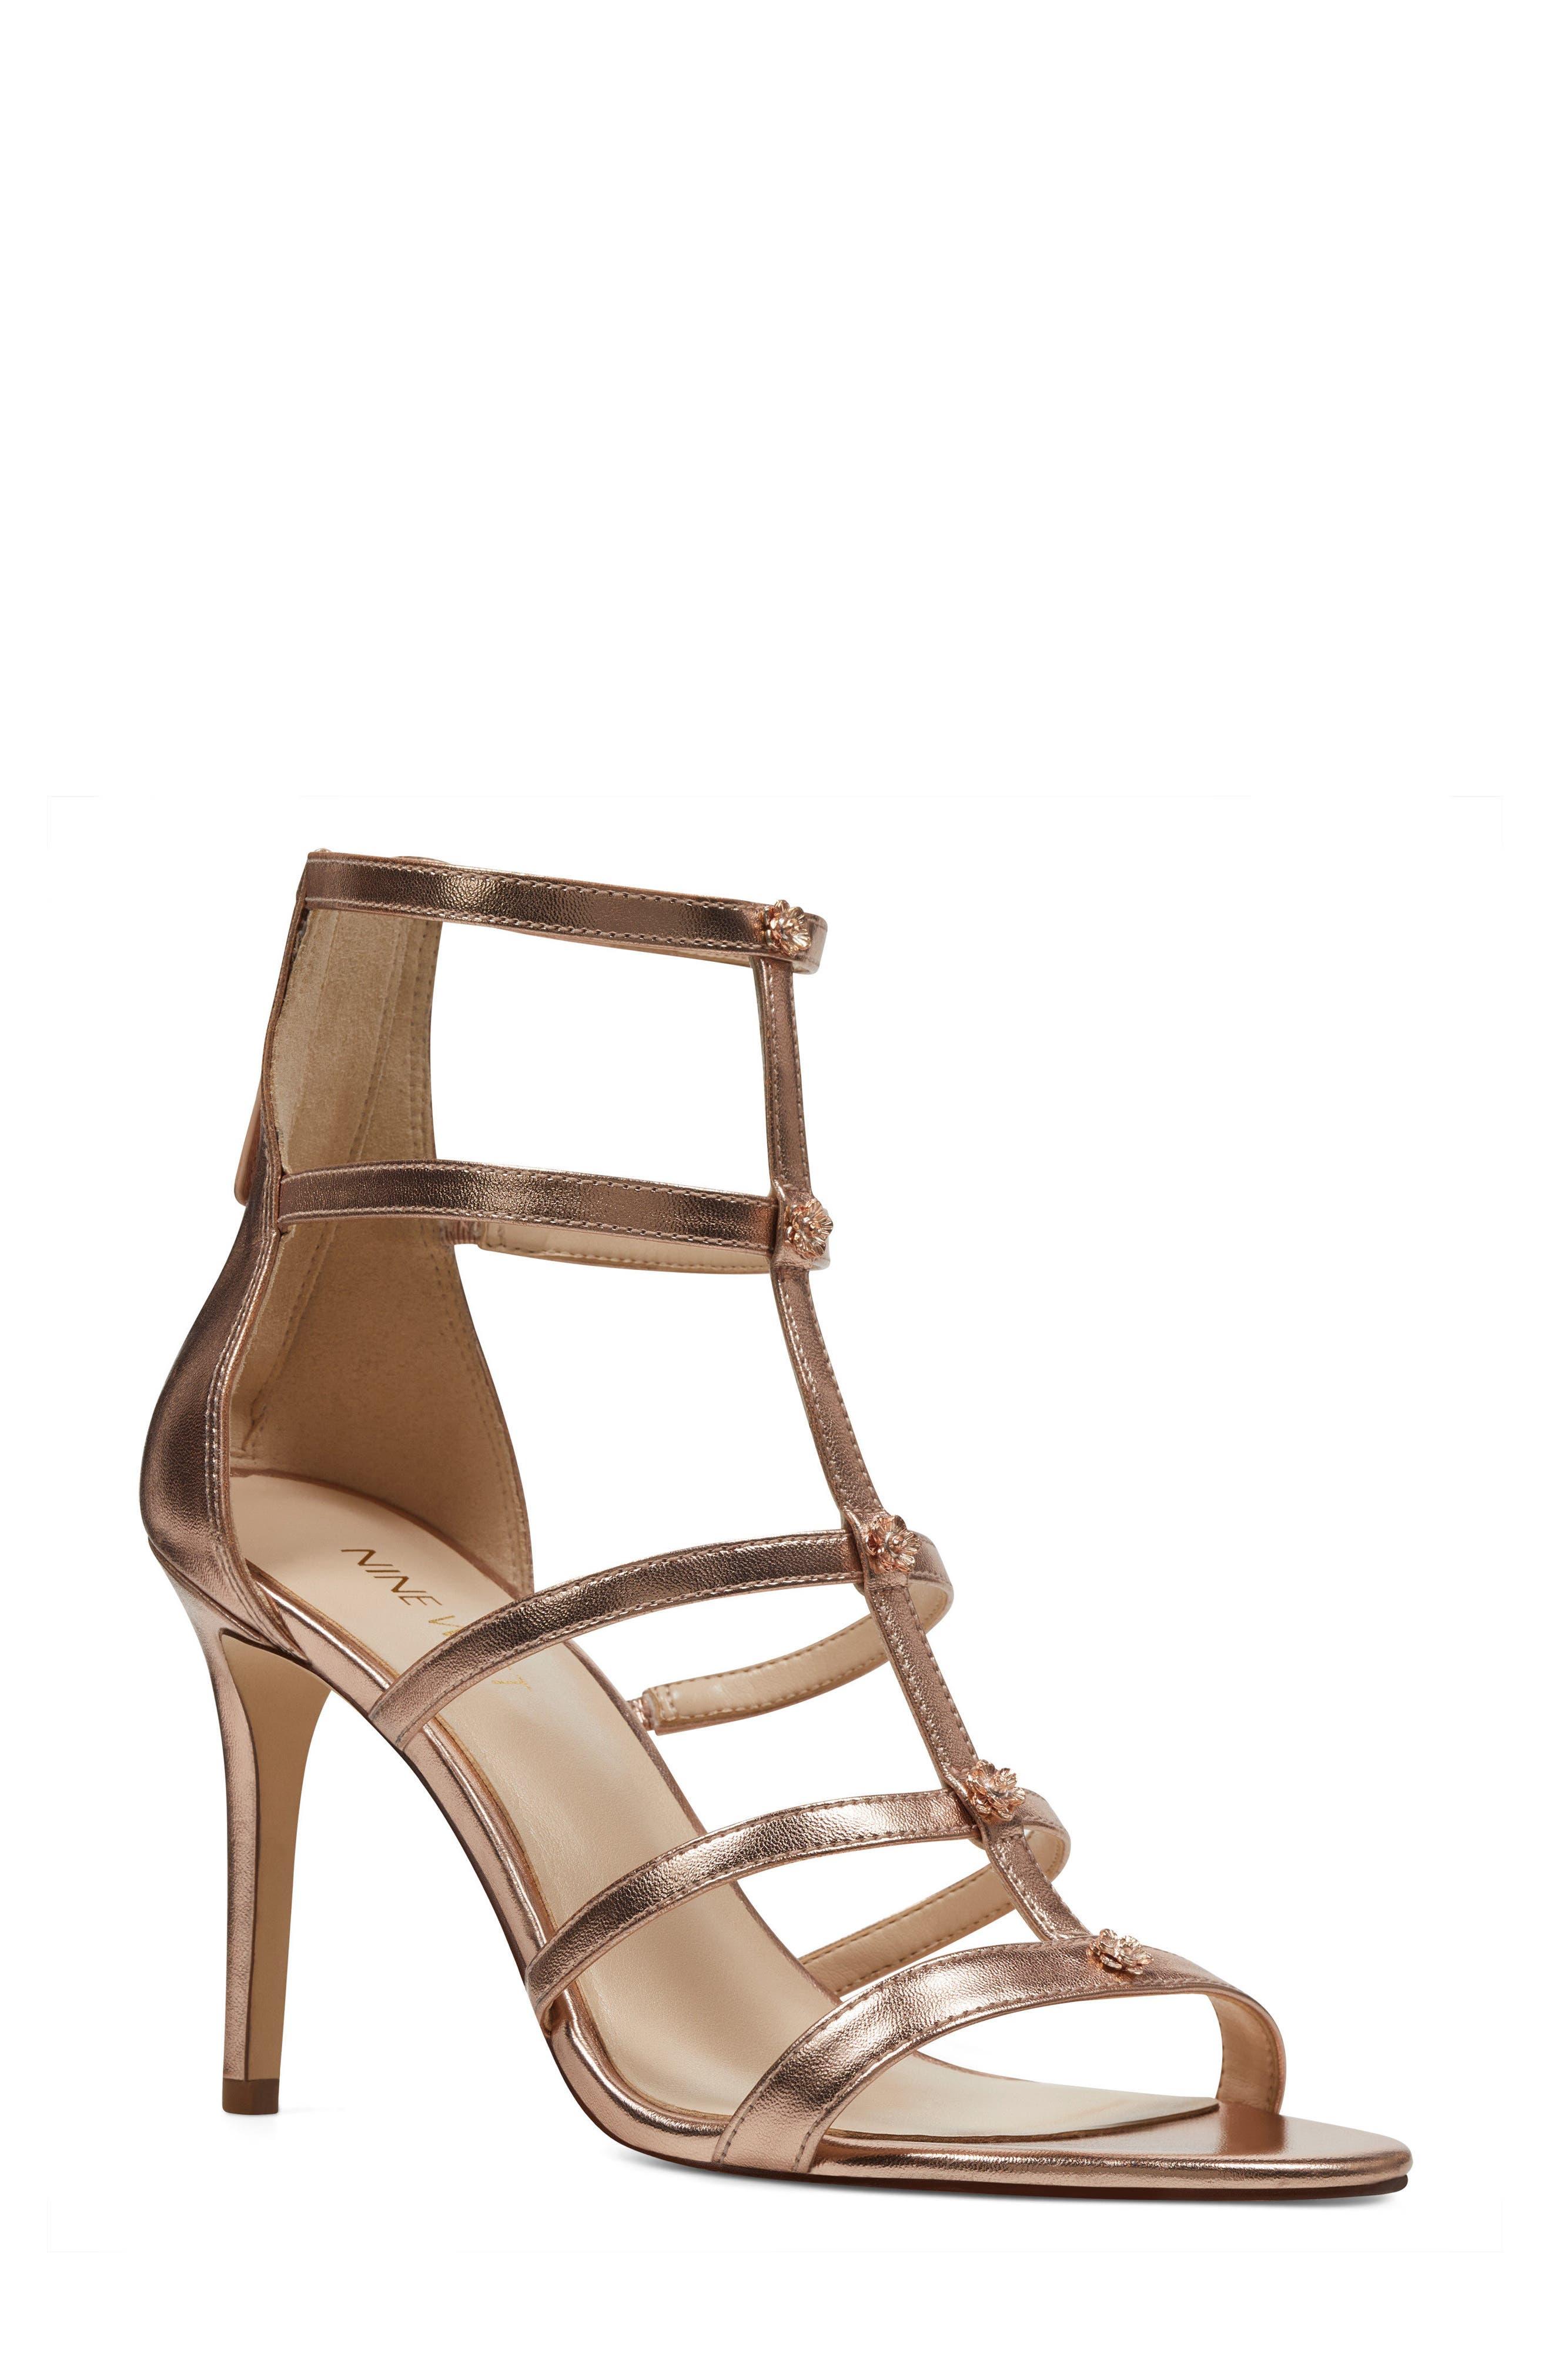 Main Image - Nine West Nayler Strappy Sandal (Women)